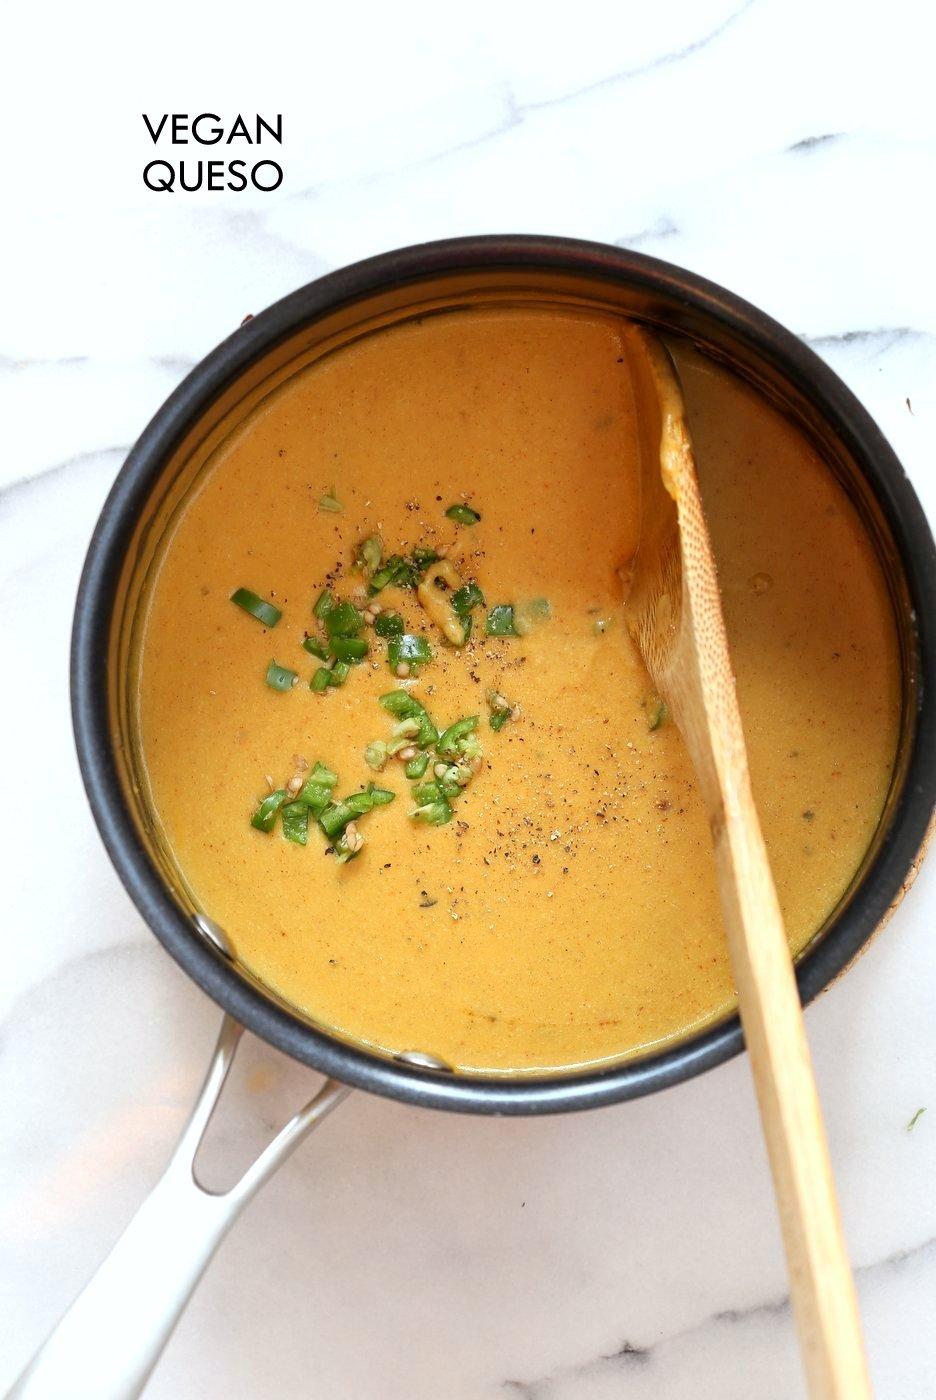 10 Minute Vegan Nacho Cheese Sauce. Easy Creamy Vegan Queso Dip. For Nachos, salads, tacos and more. Vegan Nut-free Recipe. | VeganRicha.com